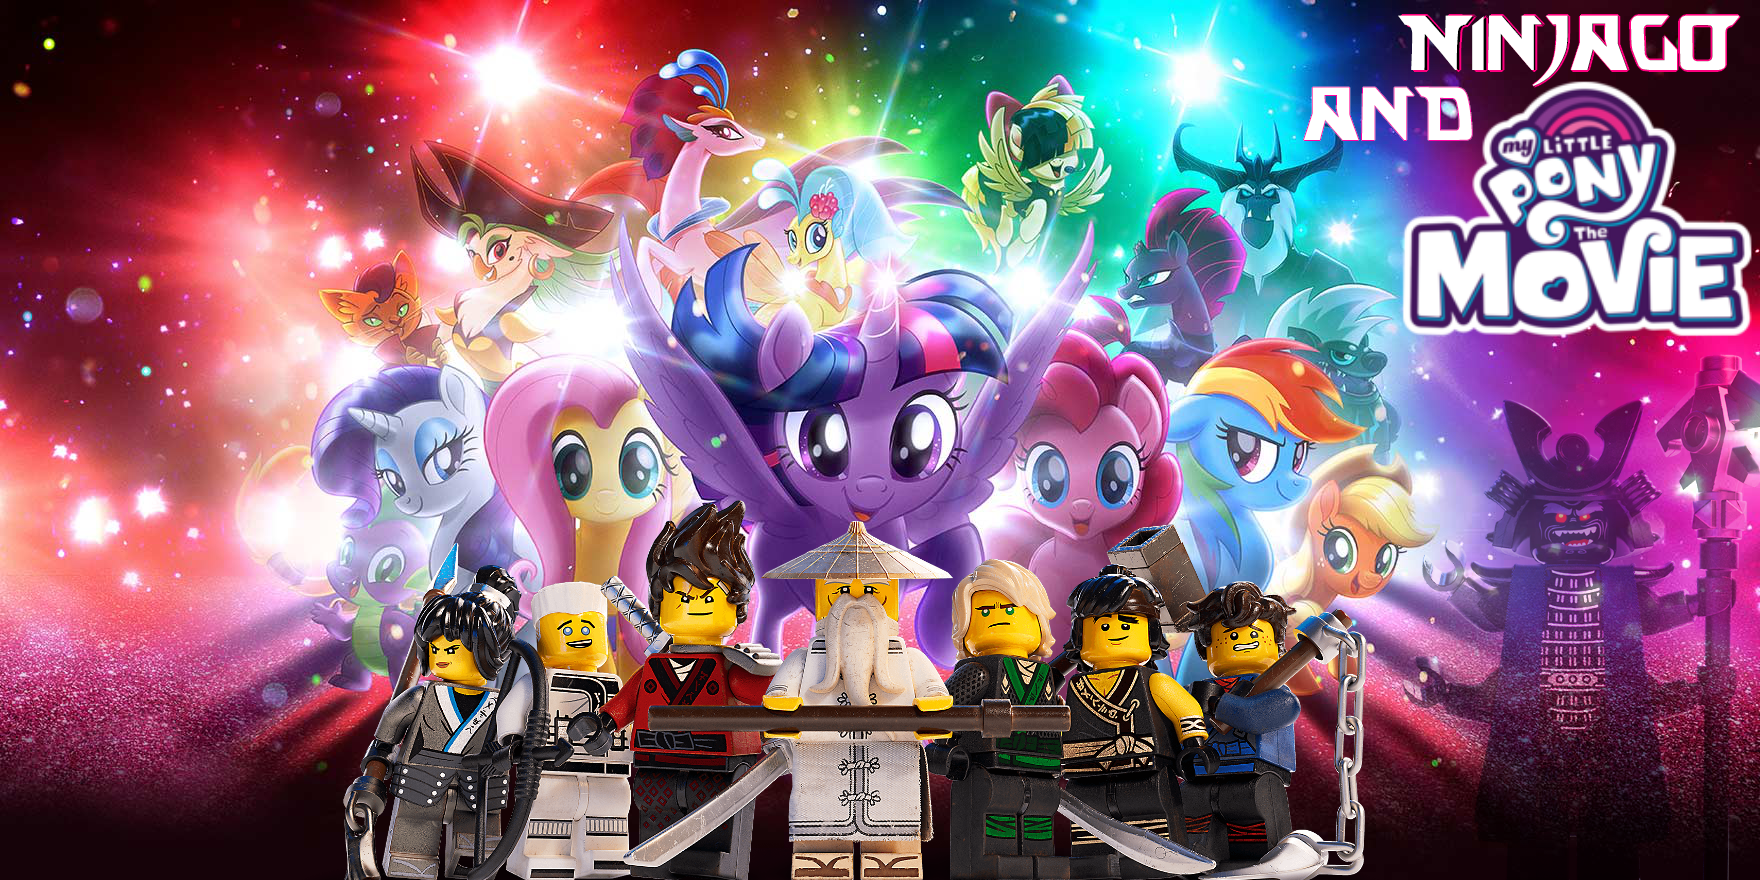 Lego Ninjago My Little Pony The Movie Better Together Crossover Wiki Fandom